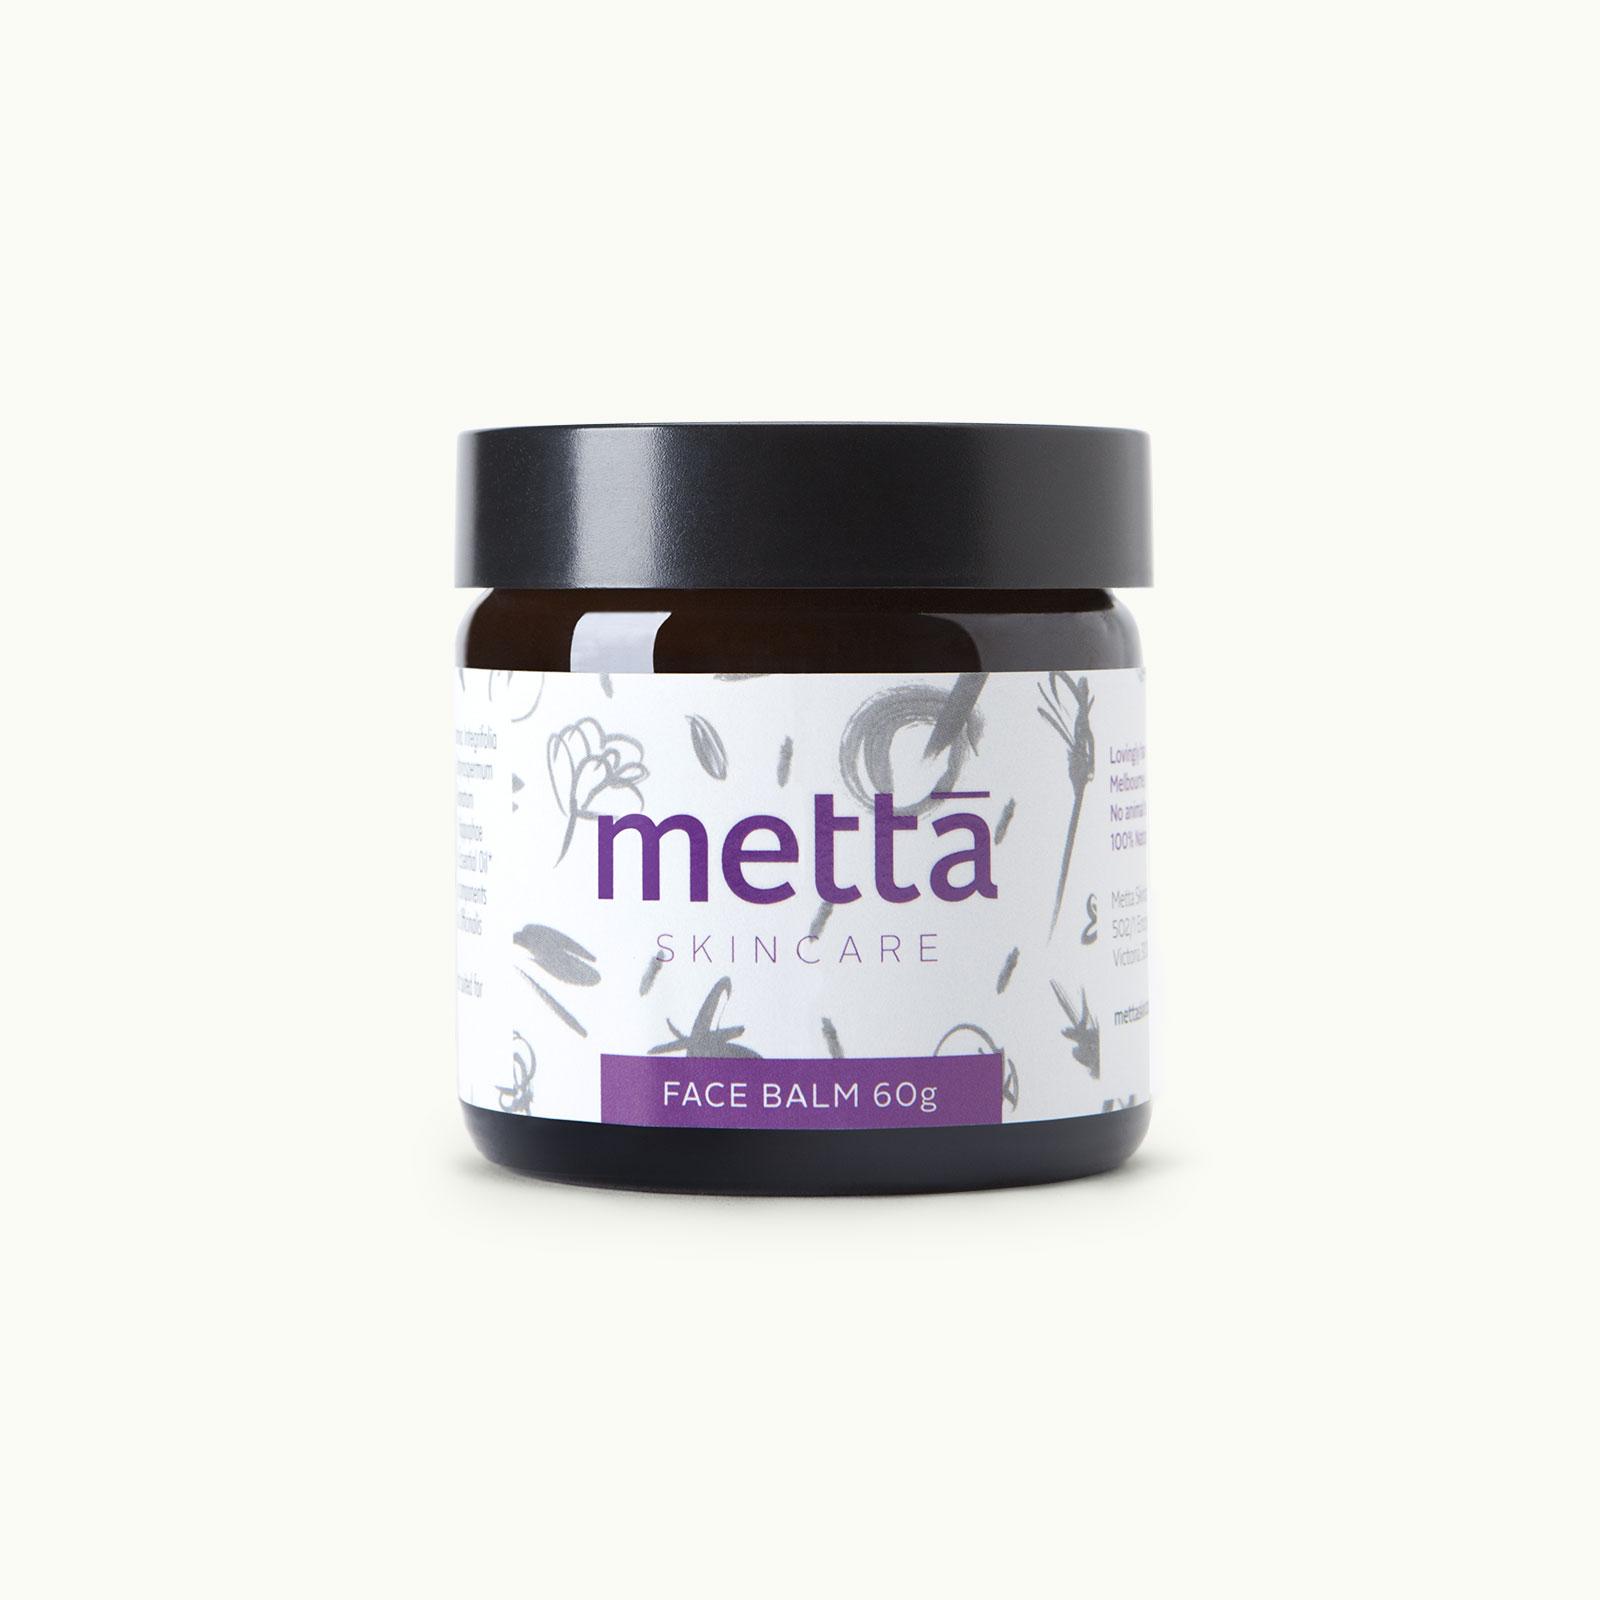 IntensiveReplenishment Face Balm by Metta Skincare